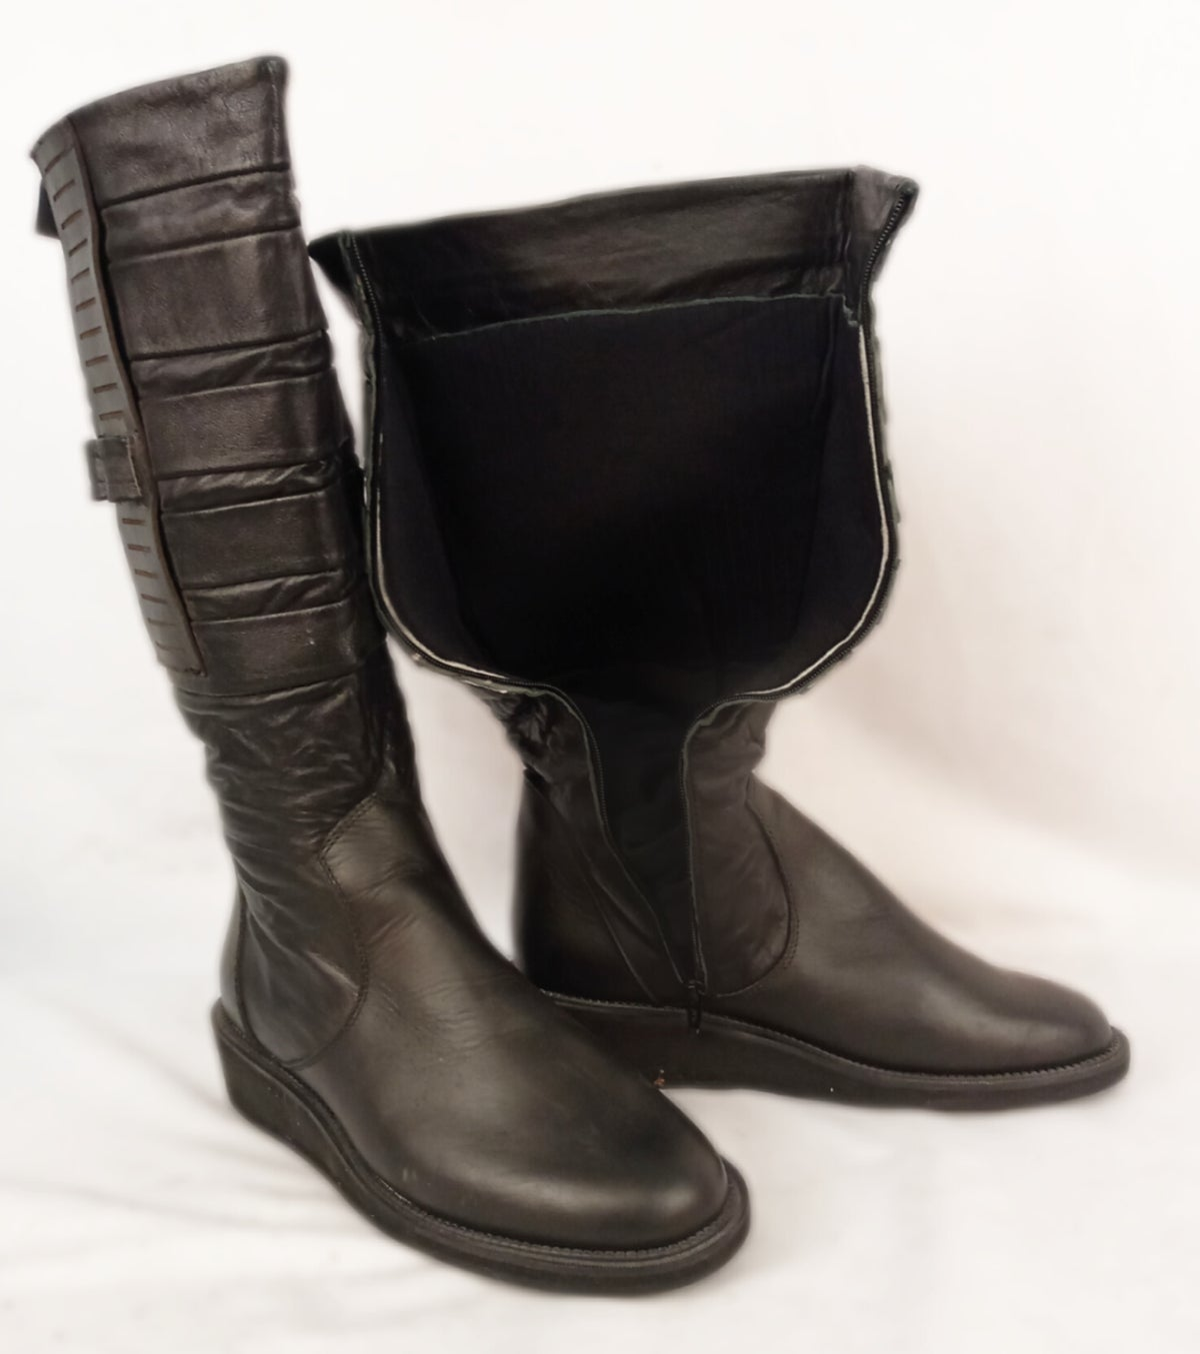 Image of #29- B Grade from Stock - Shoe Size EU 39